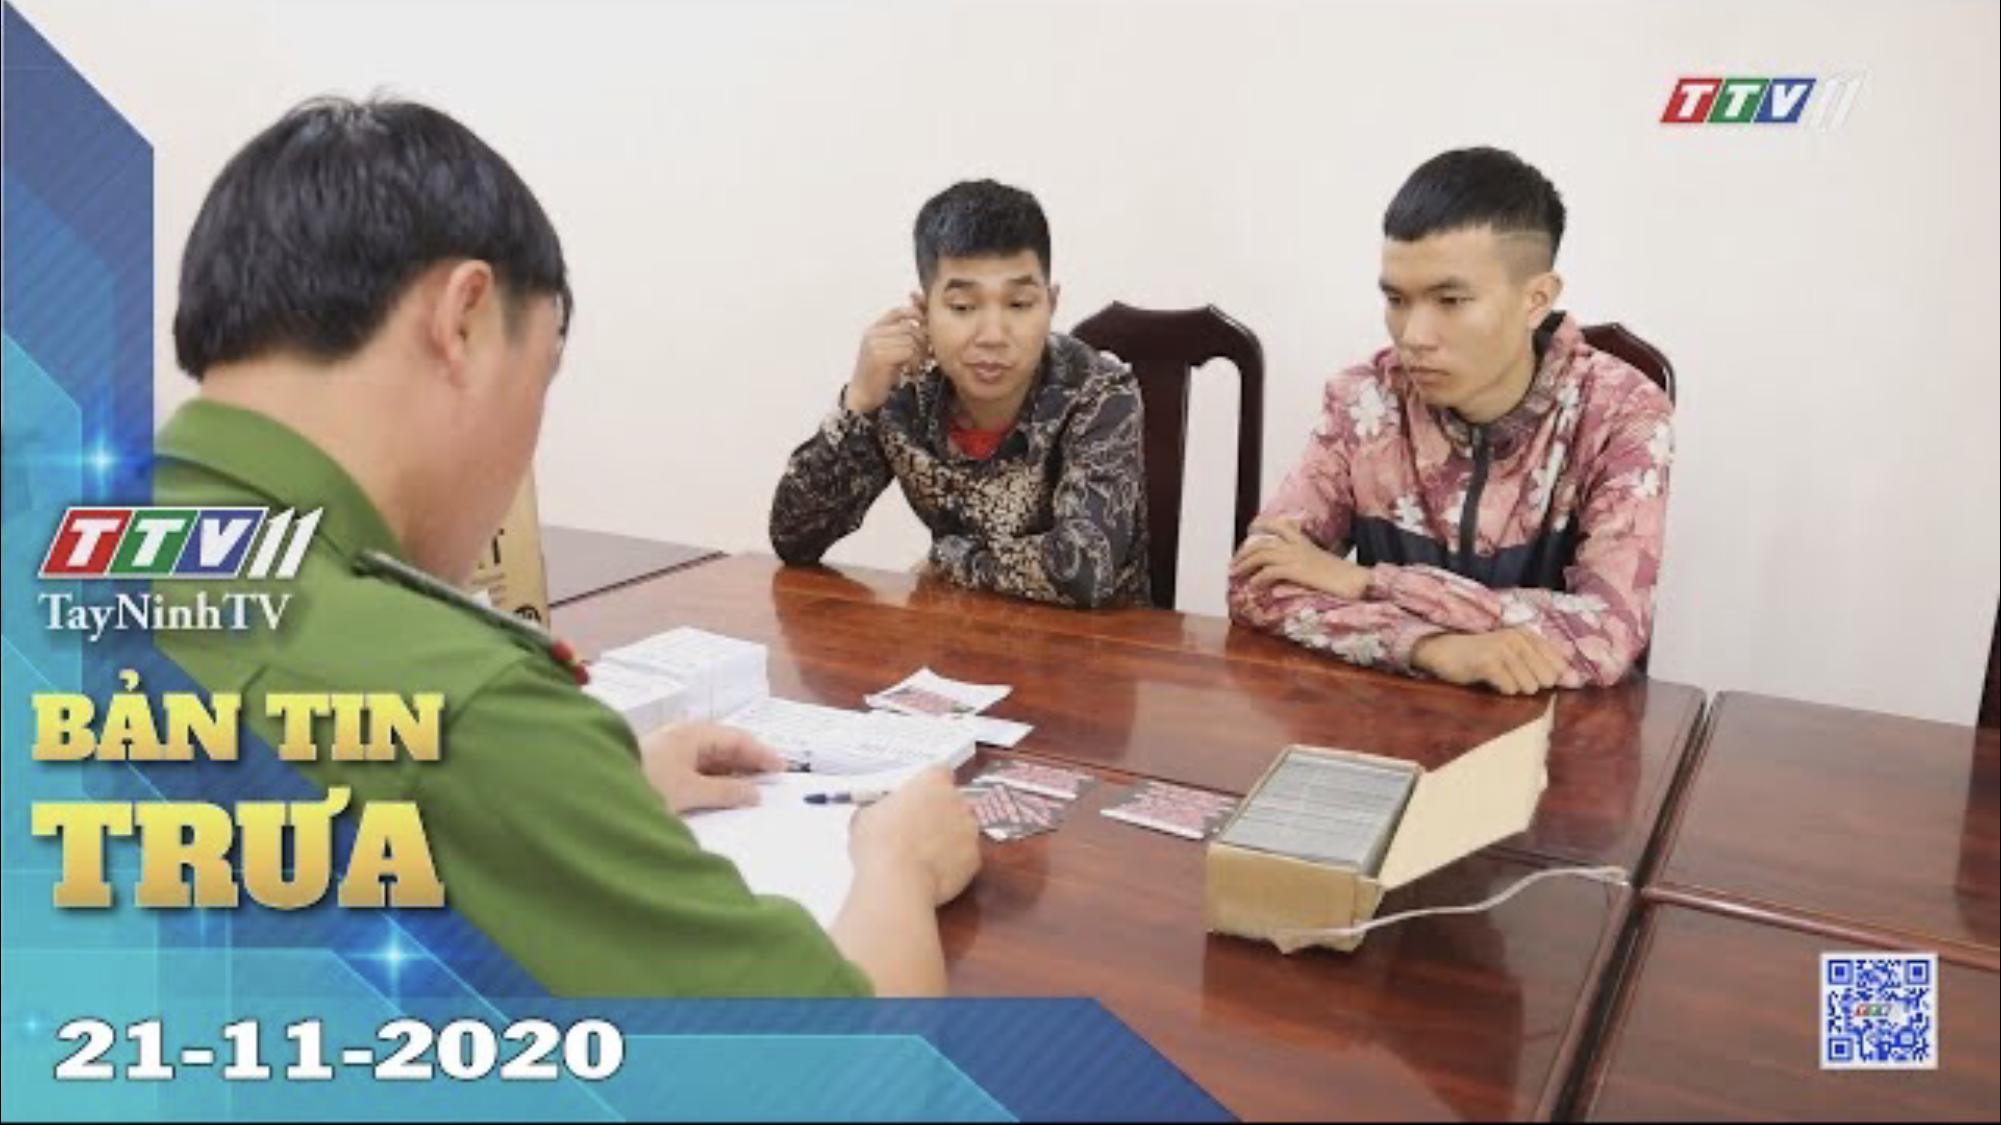 Bản tin trưa 21-11-2020 | Tin tức hôm nay | TayNinhTV